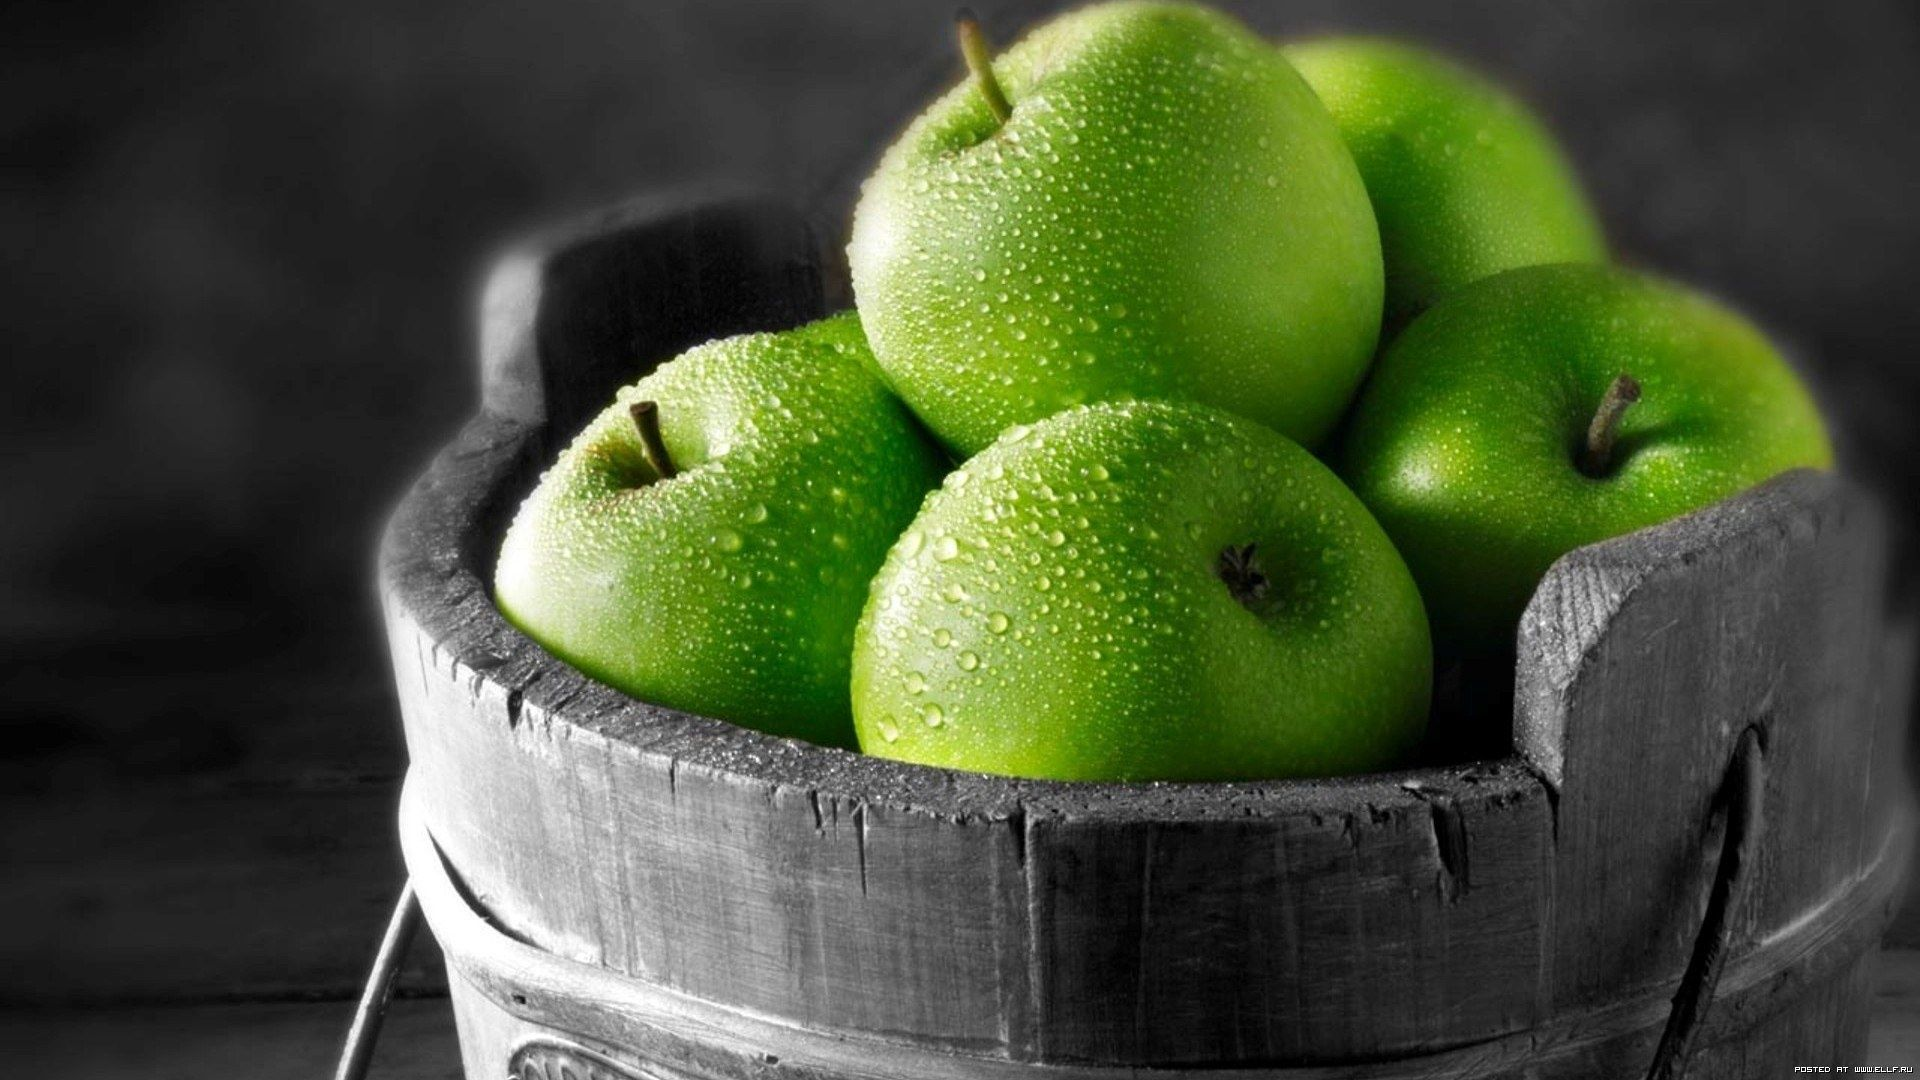 Explore Apple Wallpaper, Hd Wallpaper And More